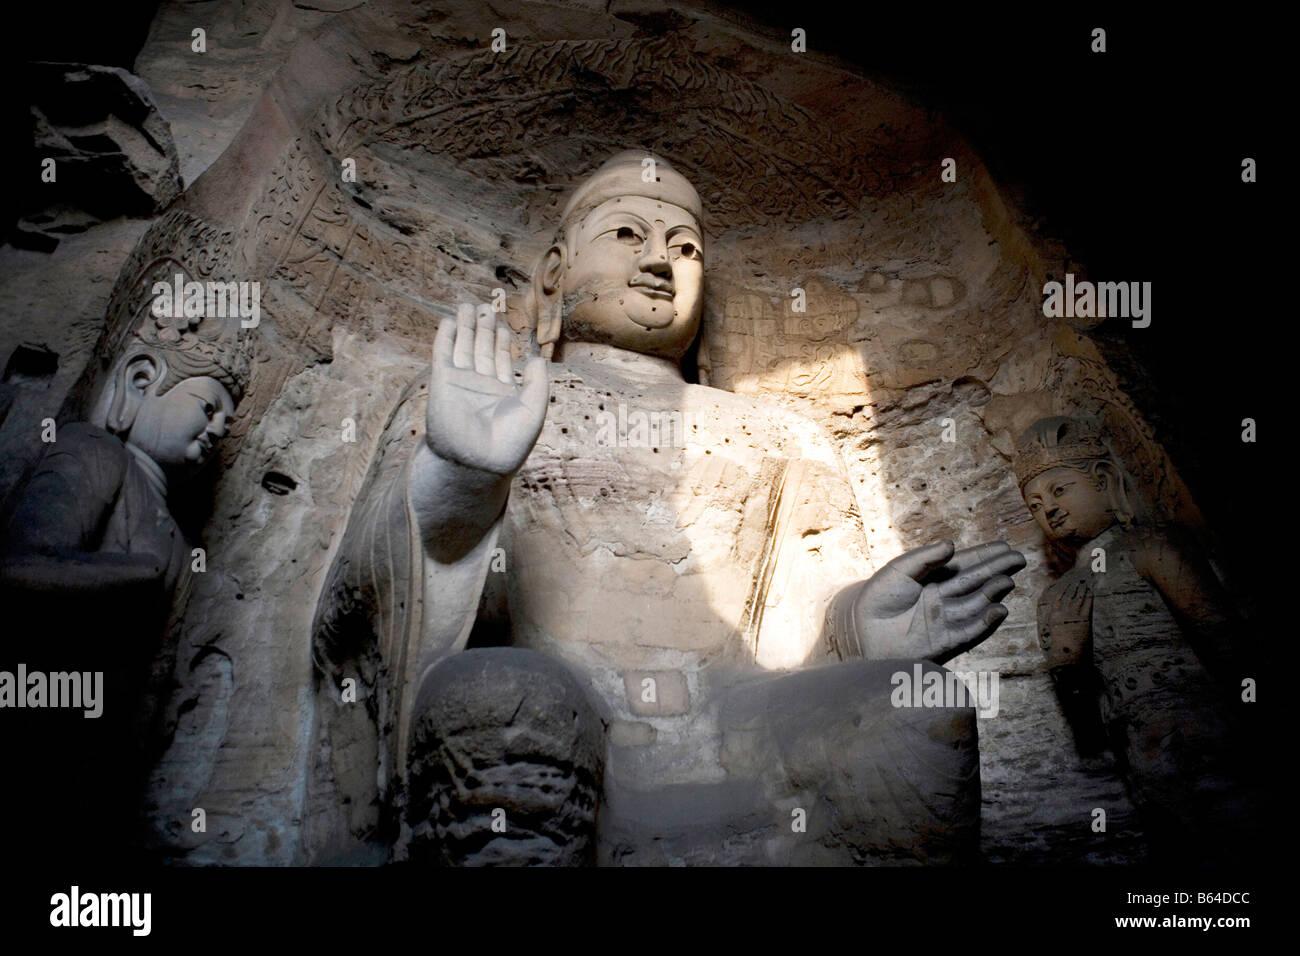 Statue of Shakyamuni, Yungang Grottoes, Shanxi Province, China - Stock Image